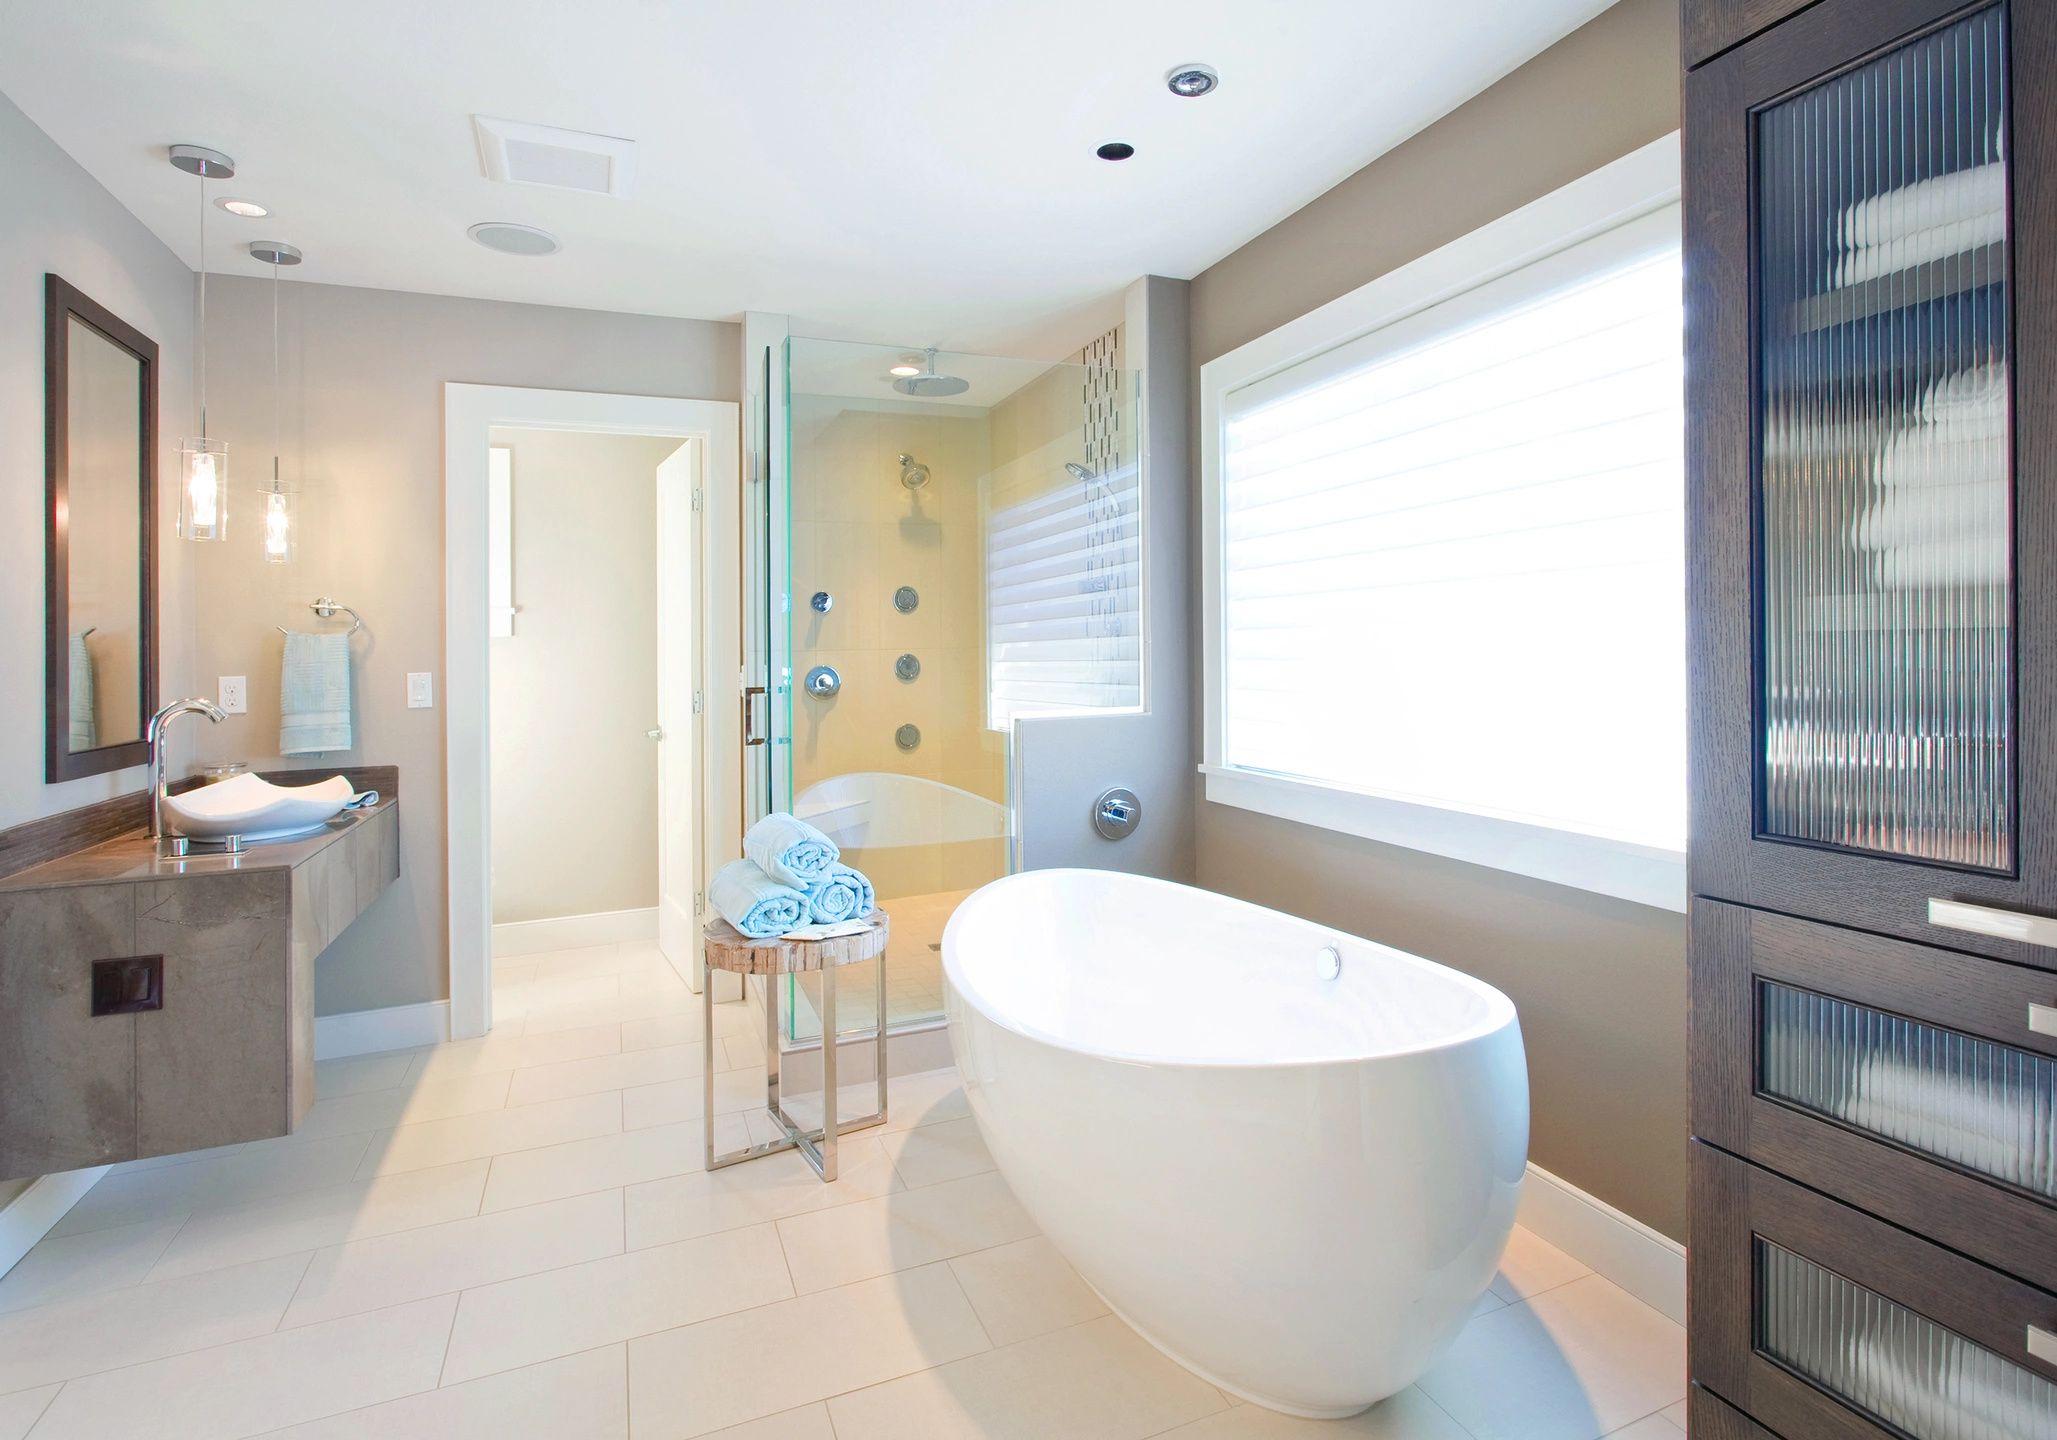 Professional Bathroom Renovation Canonsburg-PA